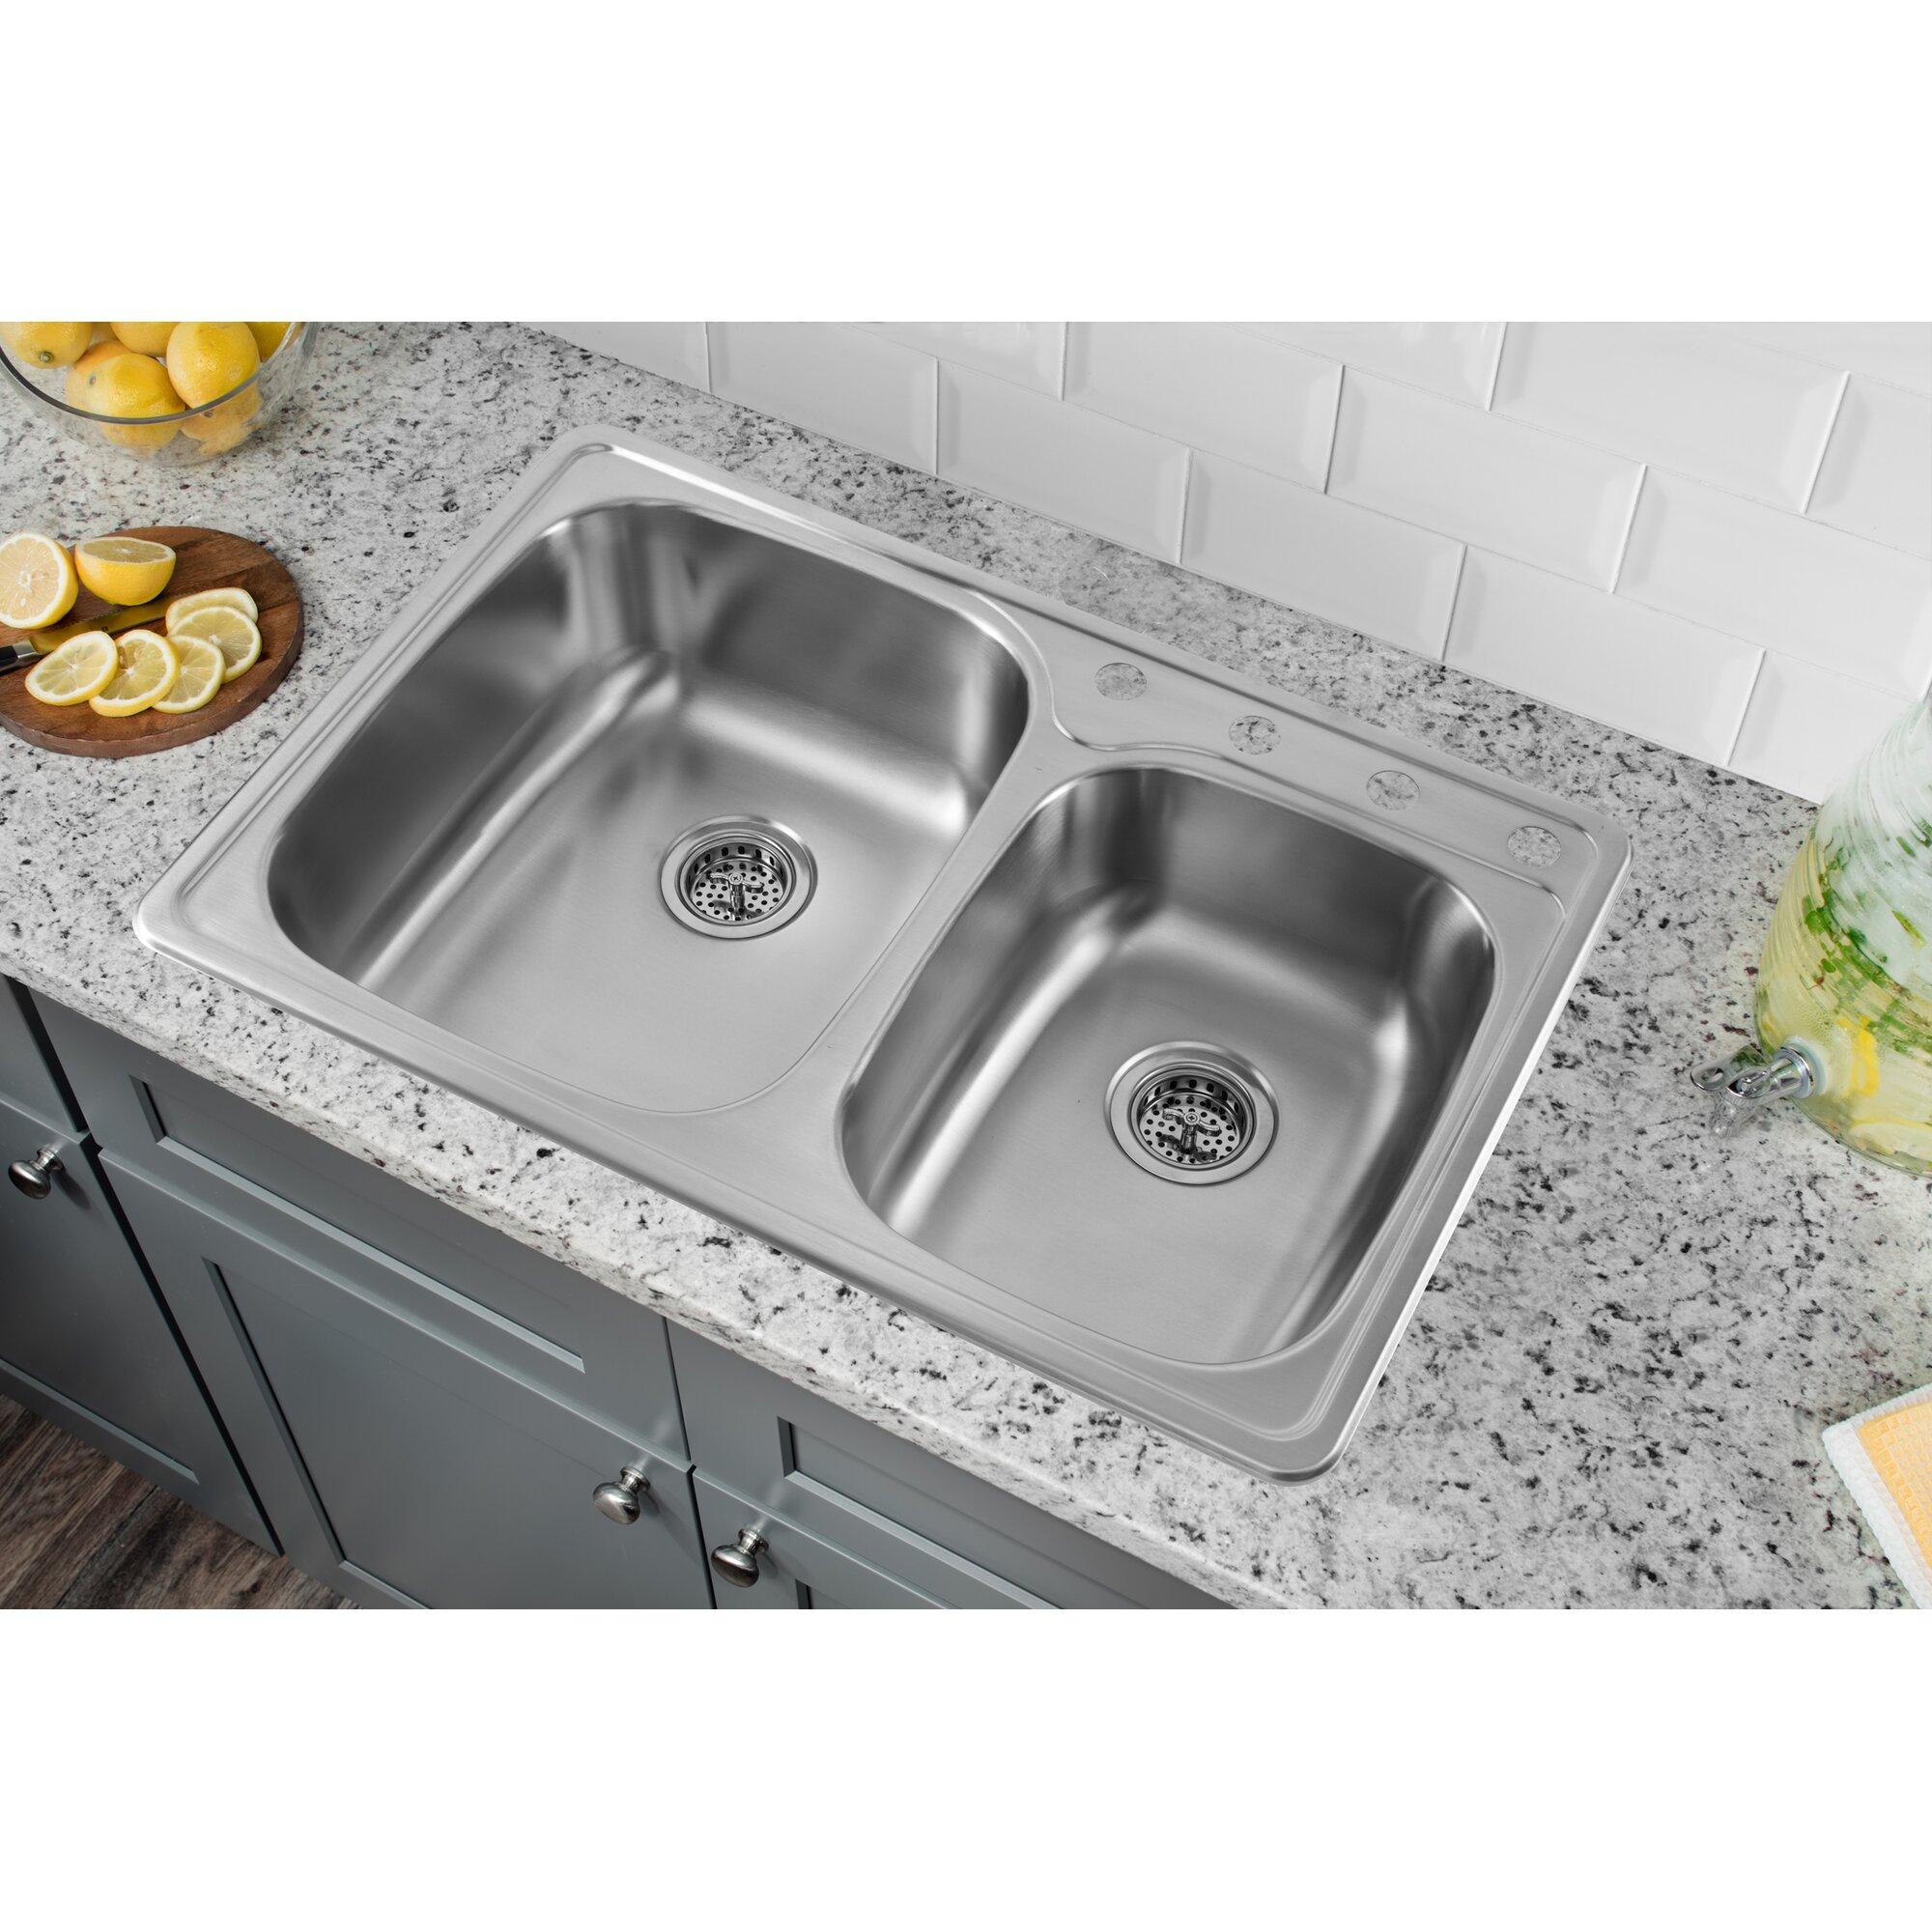 33 x 22 stainless steel drop in double bowl kitchen sink - Bowl Kitchen Sink